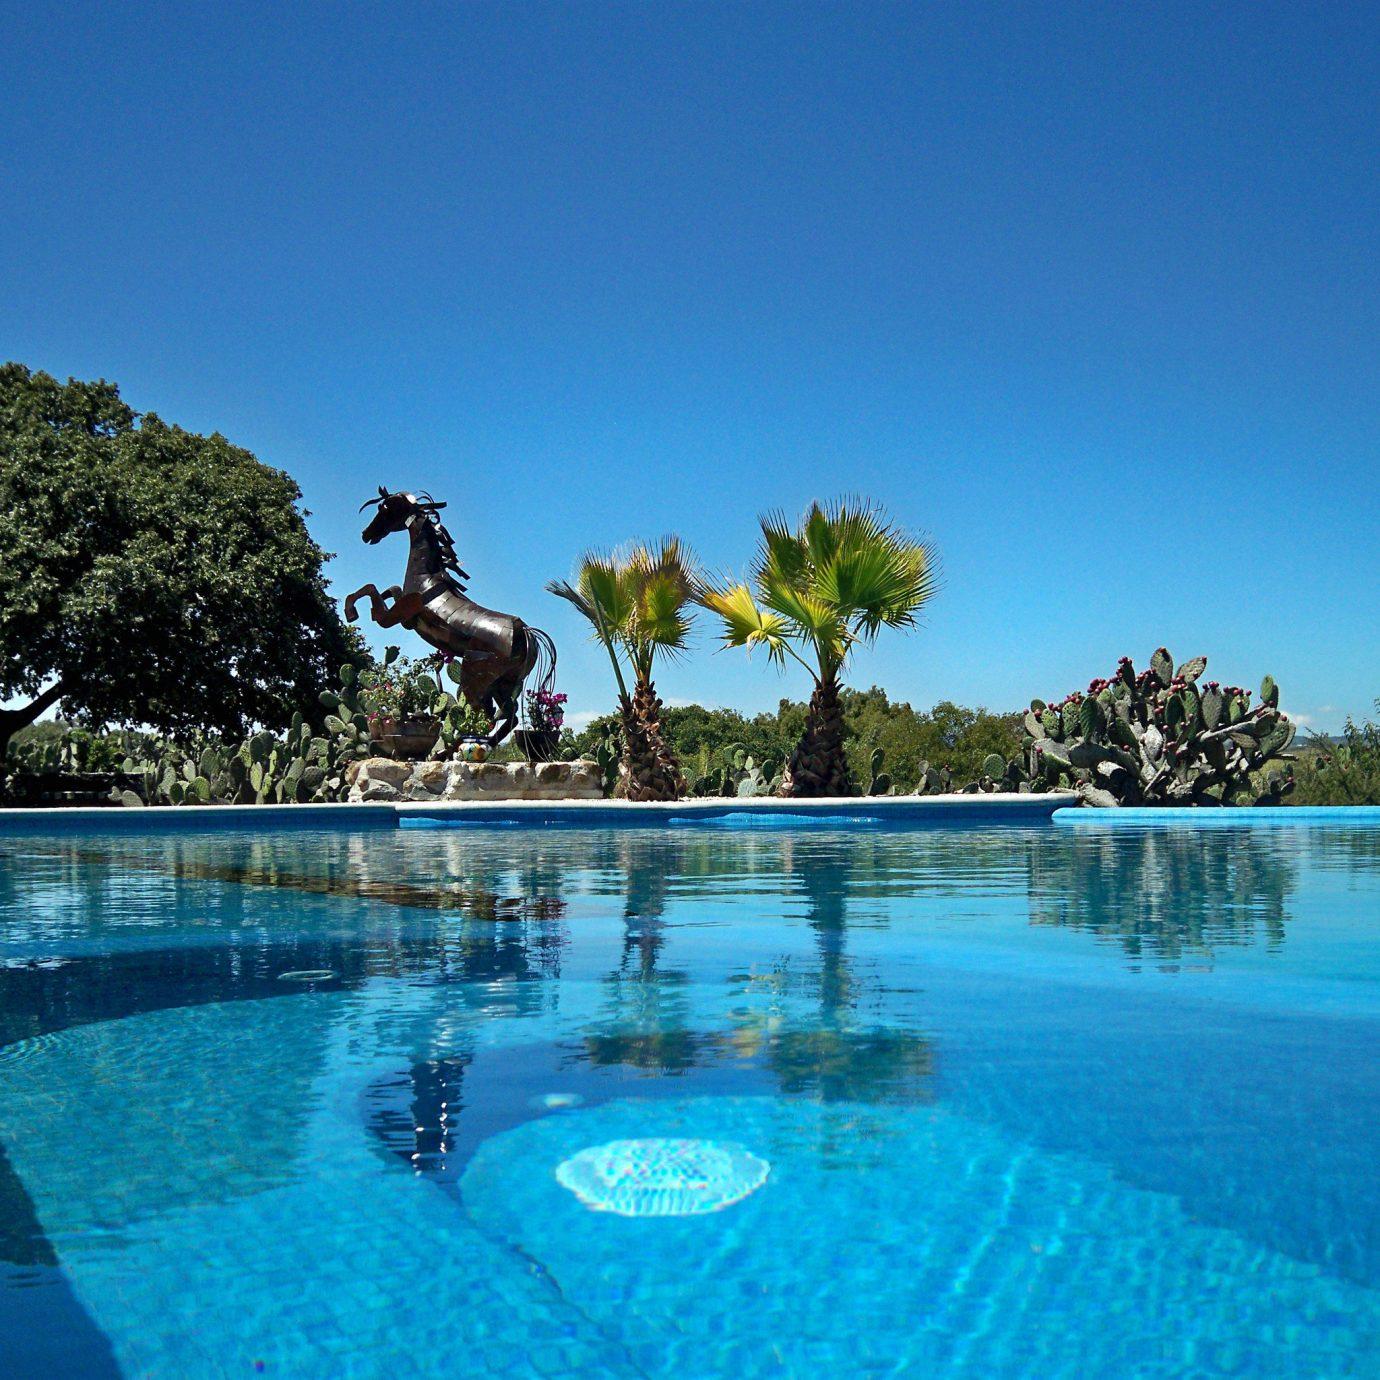 Grounds Pool water sky swimming pool leisure Lake Nature Resort pond Lagoon resort town Sea swimming reef blue